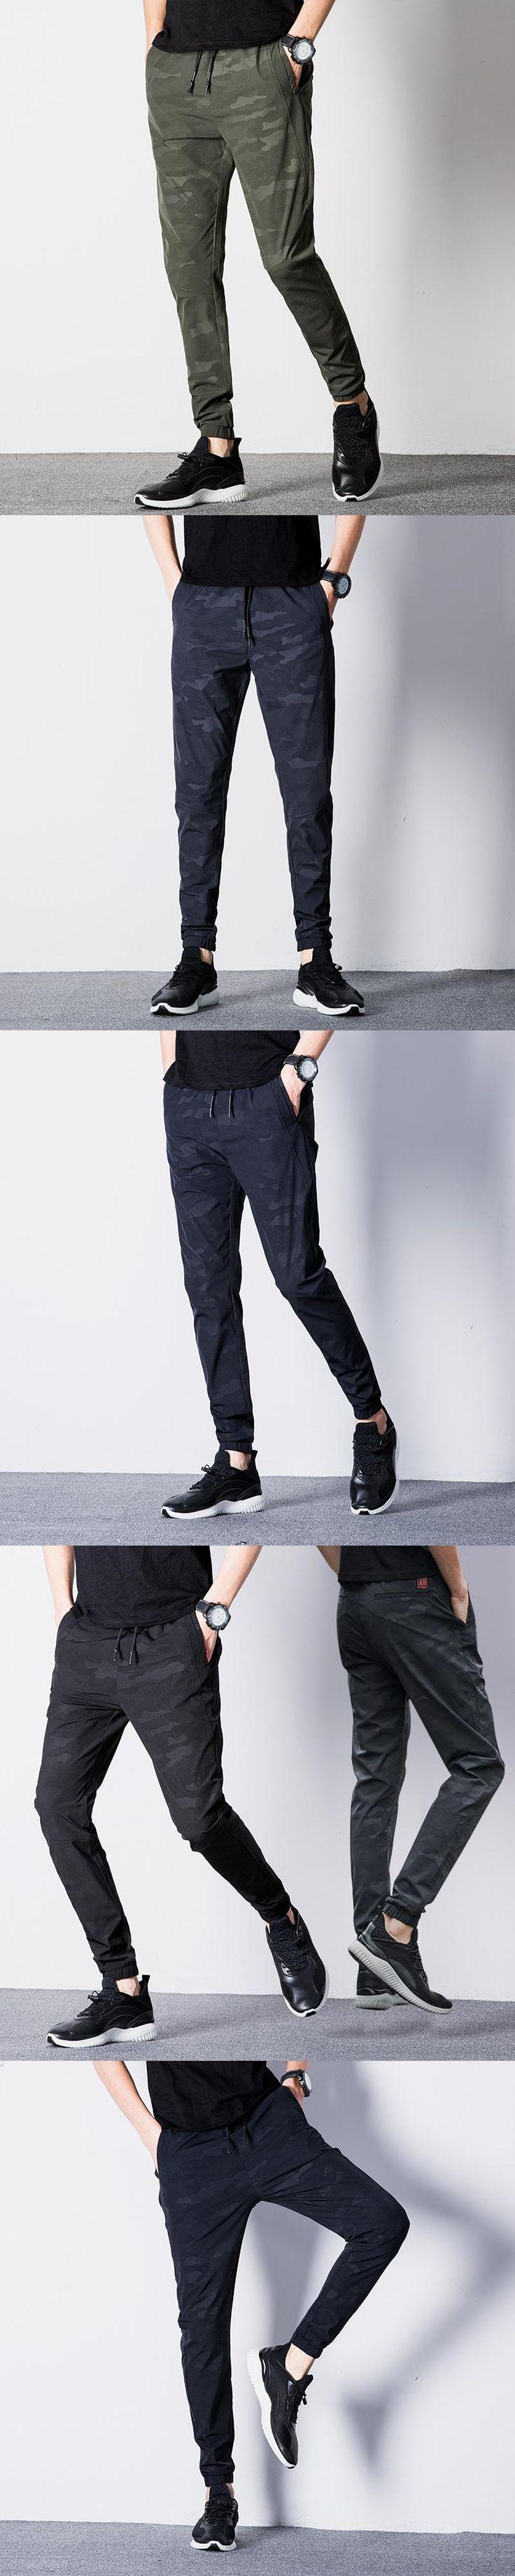 2017 Mens summer Army Casual Harem Pants Men Joggers Male Camo Pants Military long Trousers Elastic Waist Fitness sweatpants 38